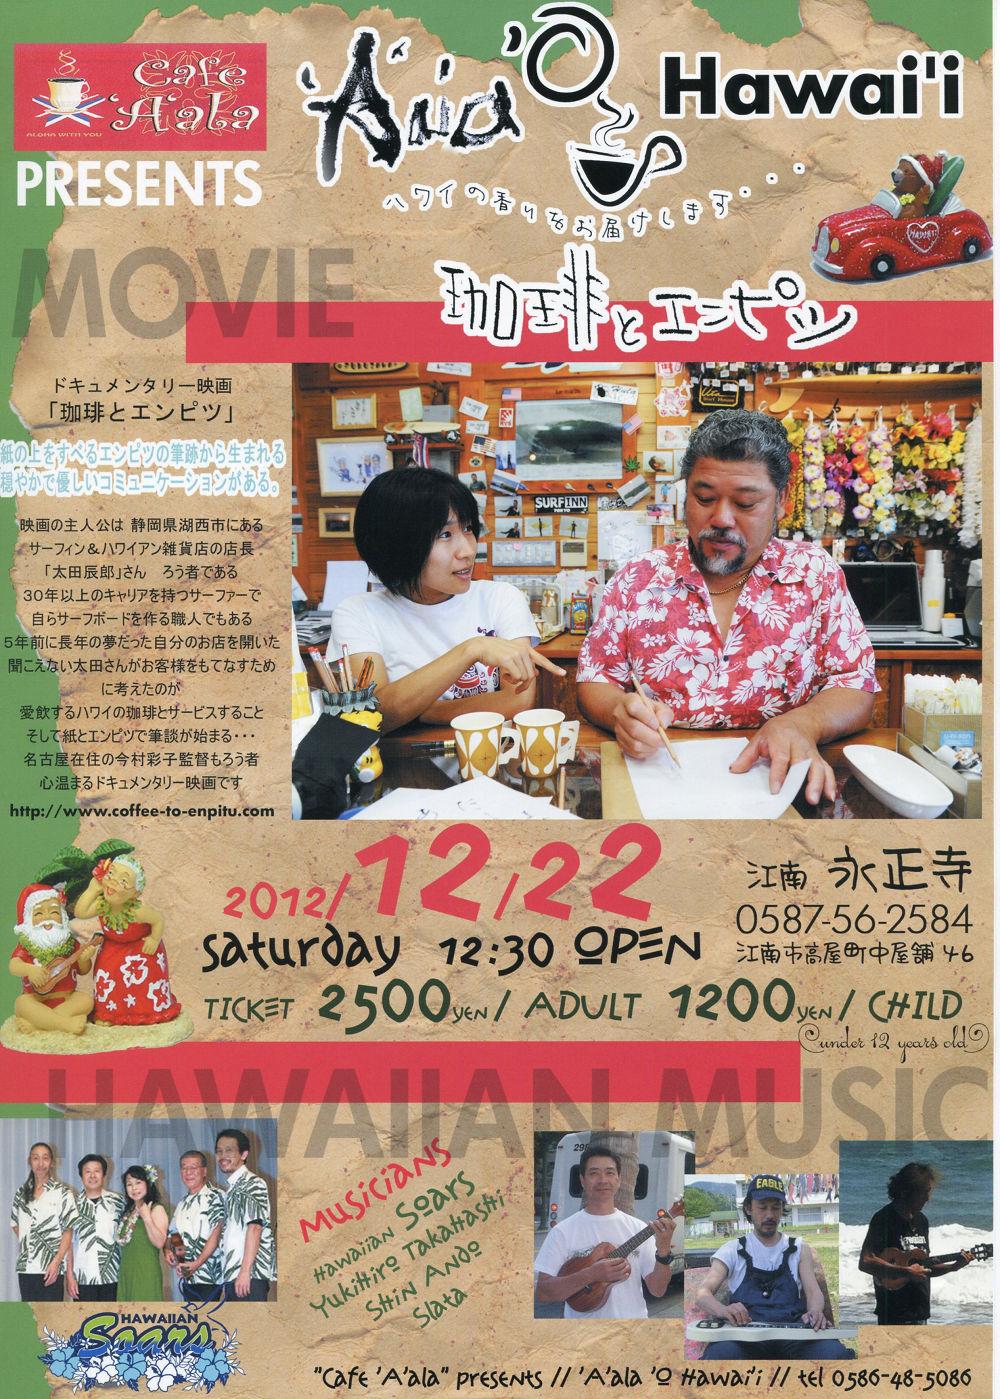 eishojigyouji/20121105153255b51.jpg